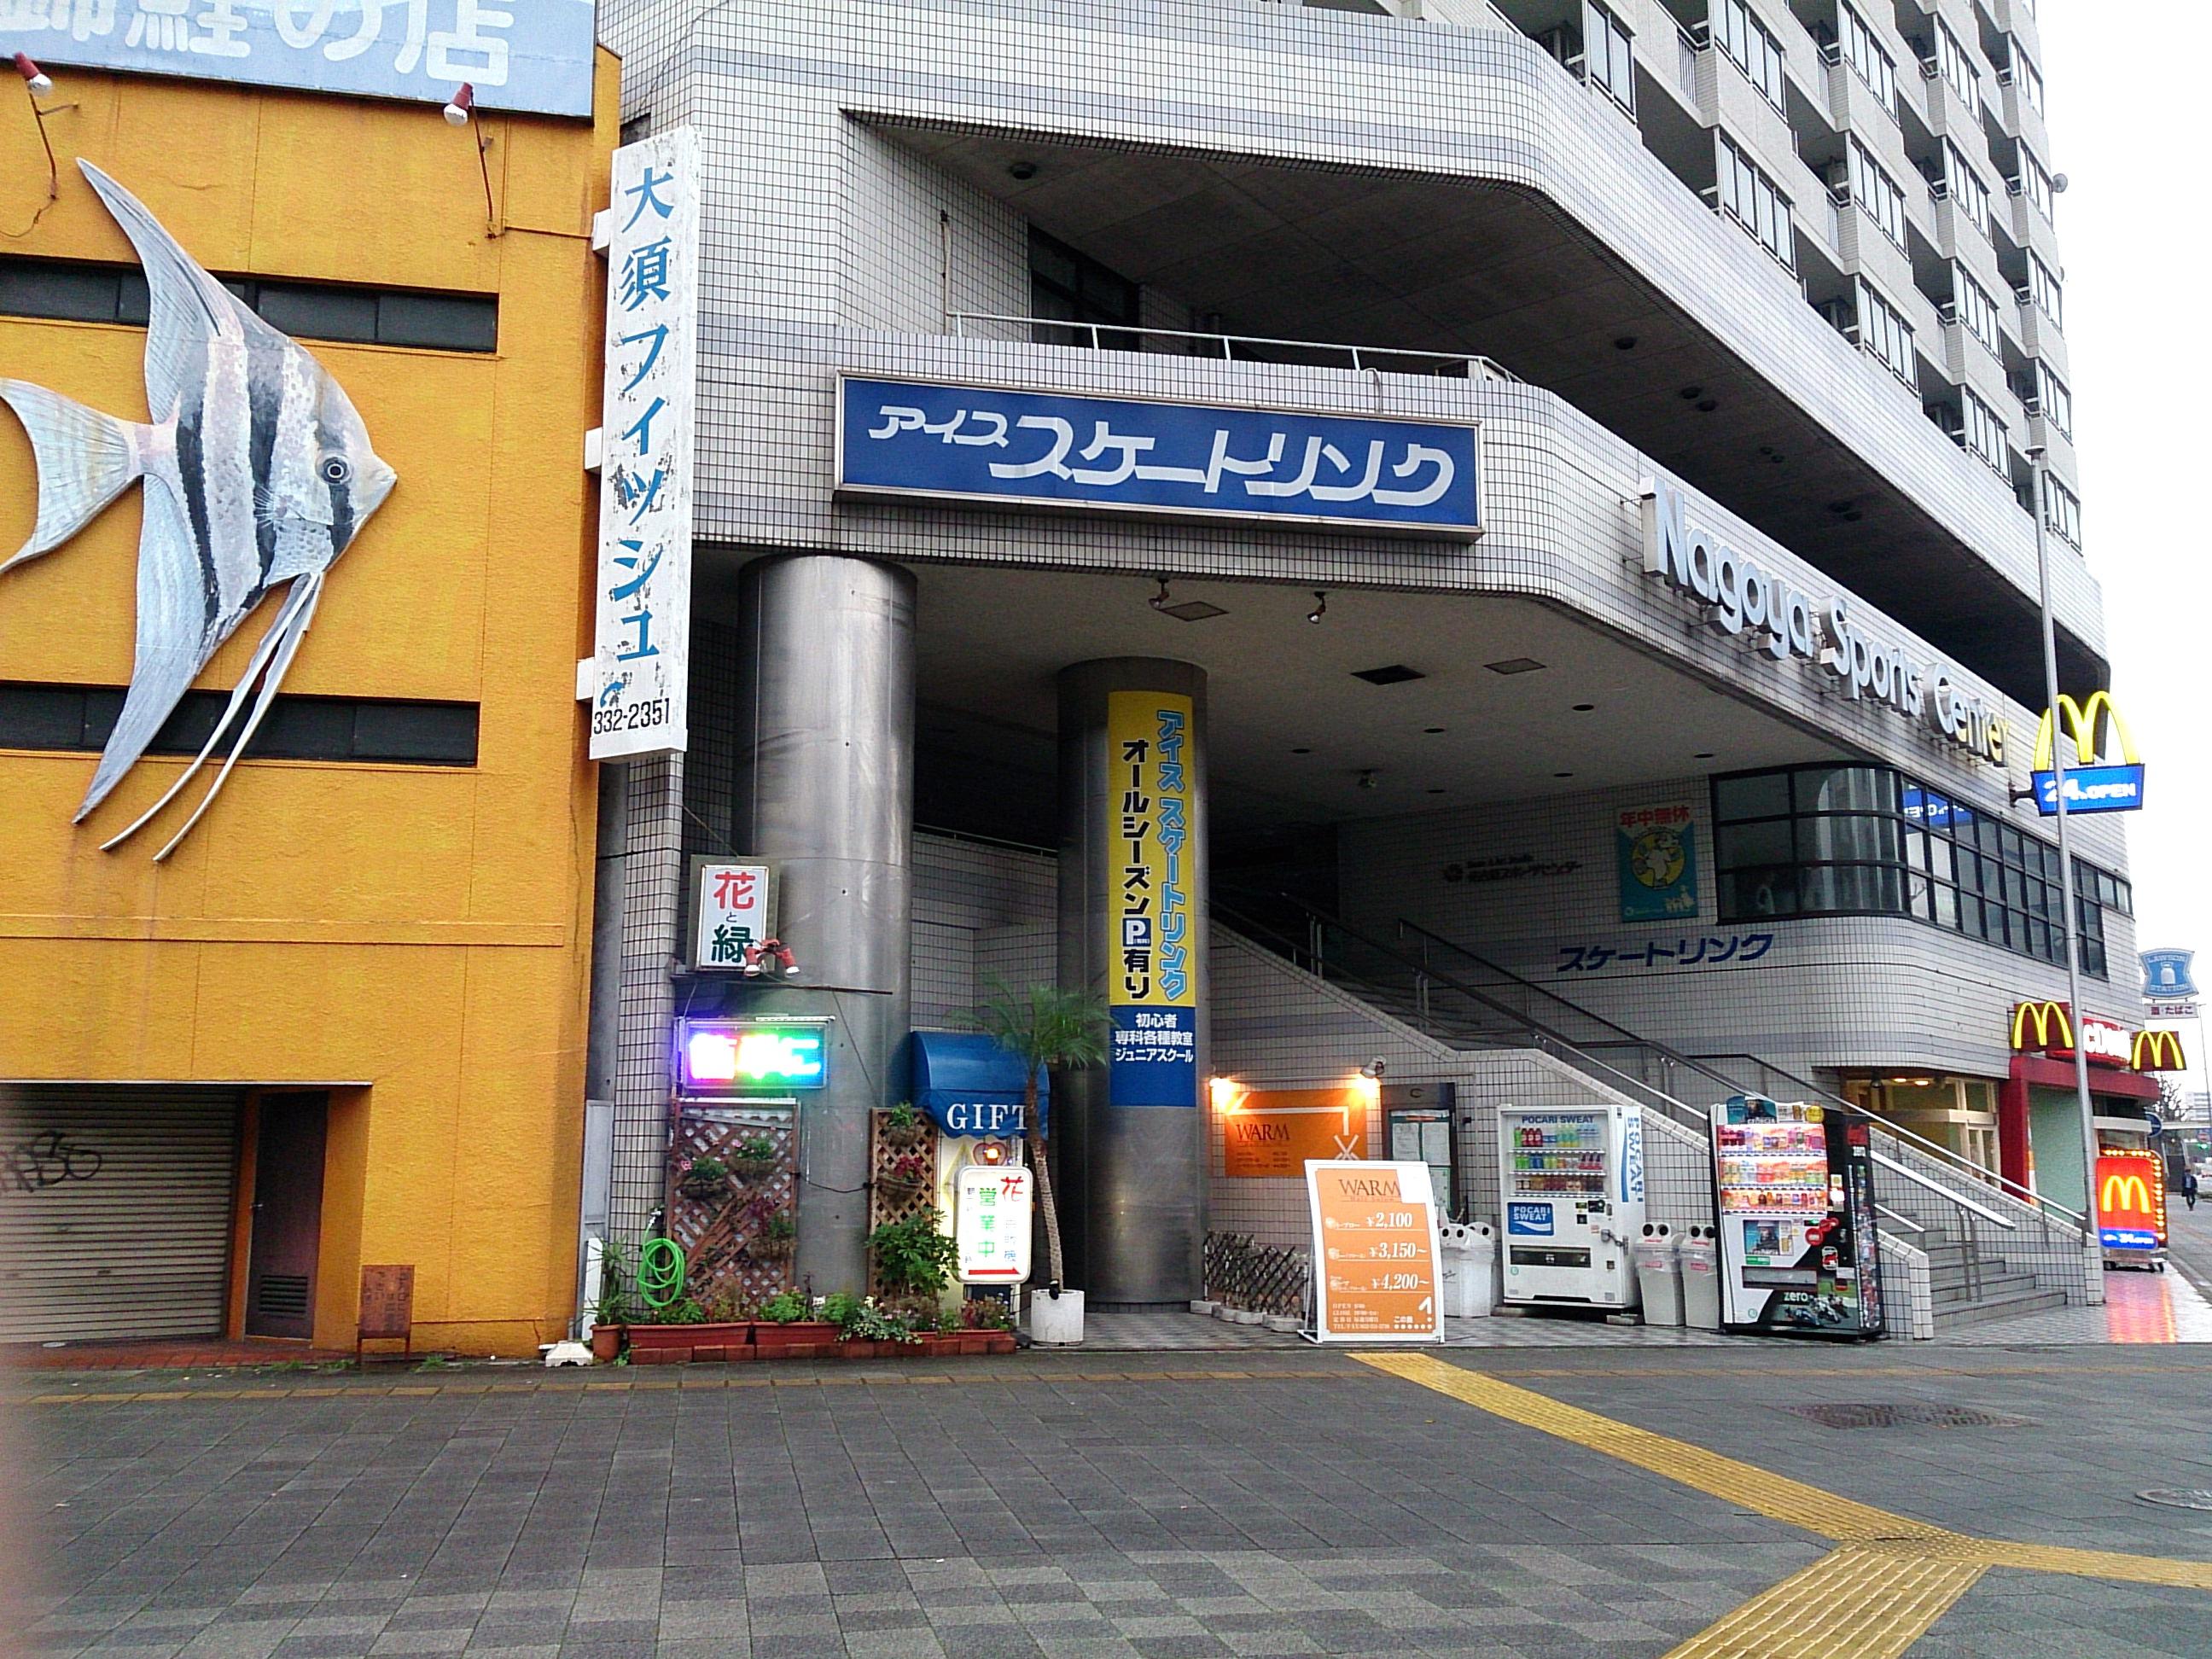 Sanpo20141129_01.jpg